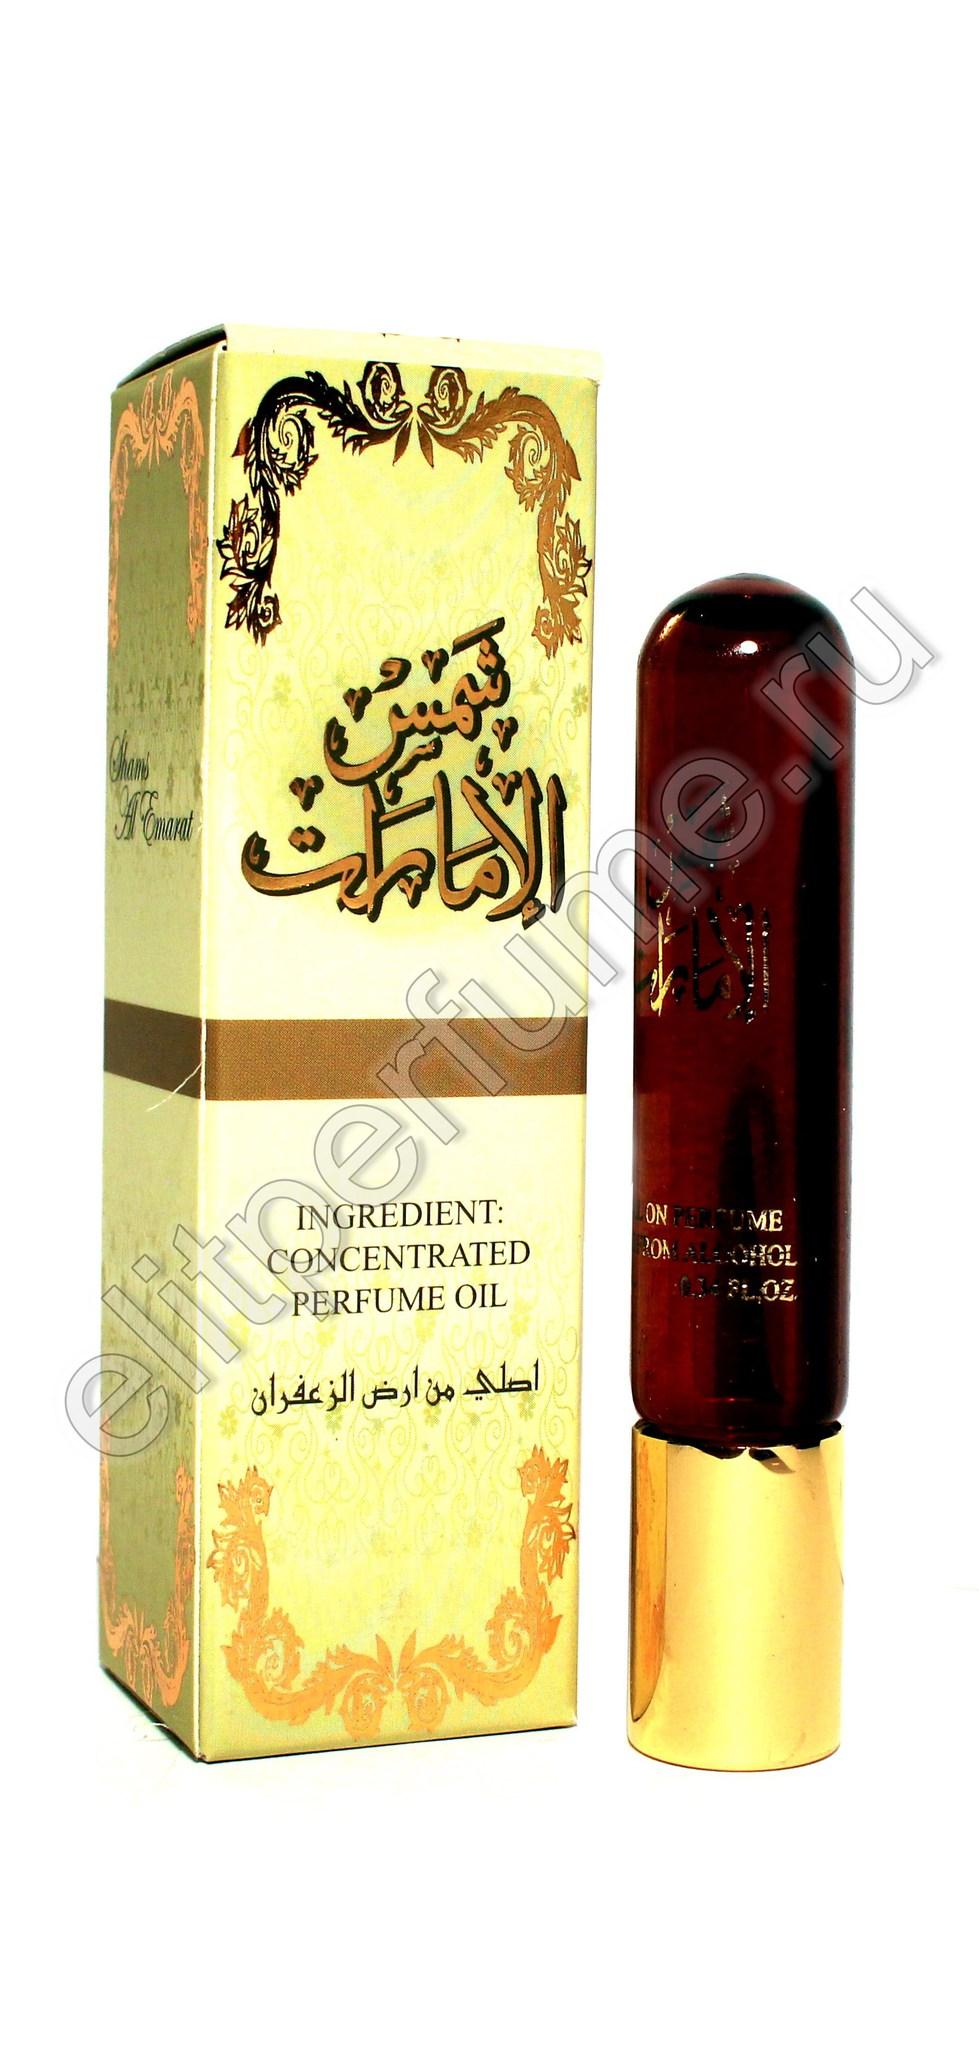 Shams Al Emarat Шамс Аль Эмарат 10 мл арабские масляные духи от Ард Аль Заафаран Ard Al Zaafaran